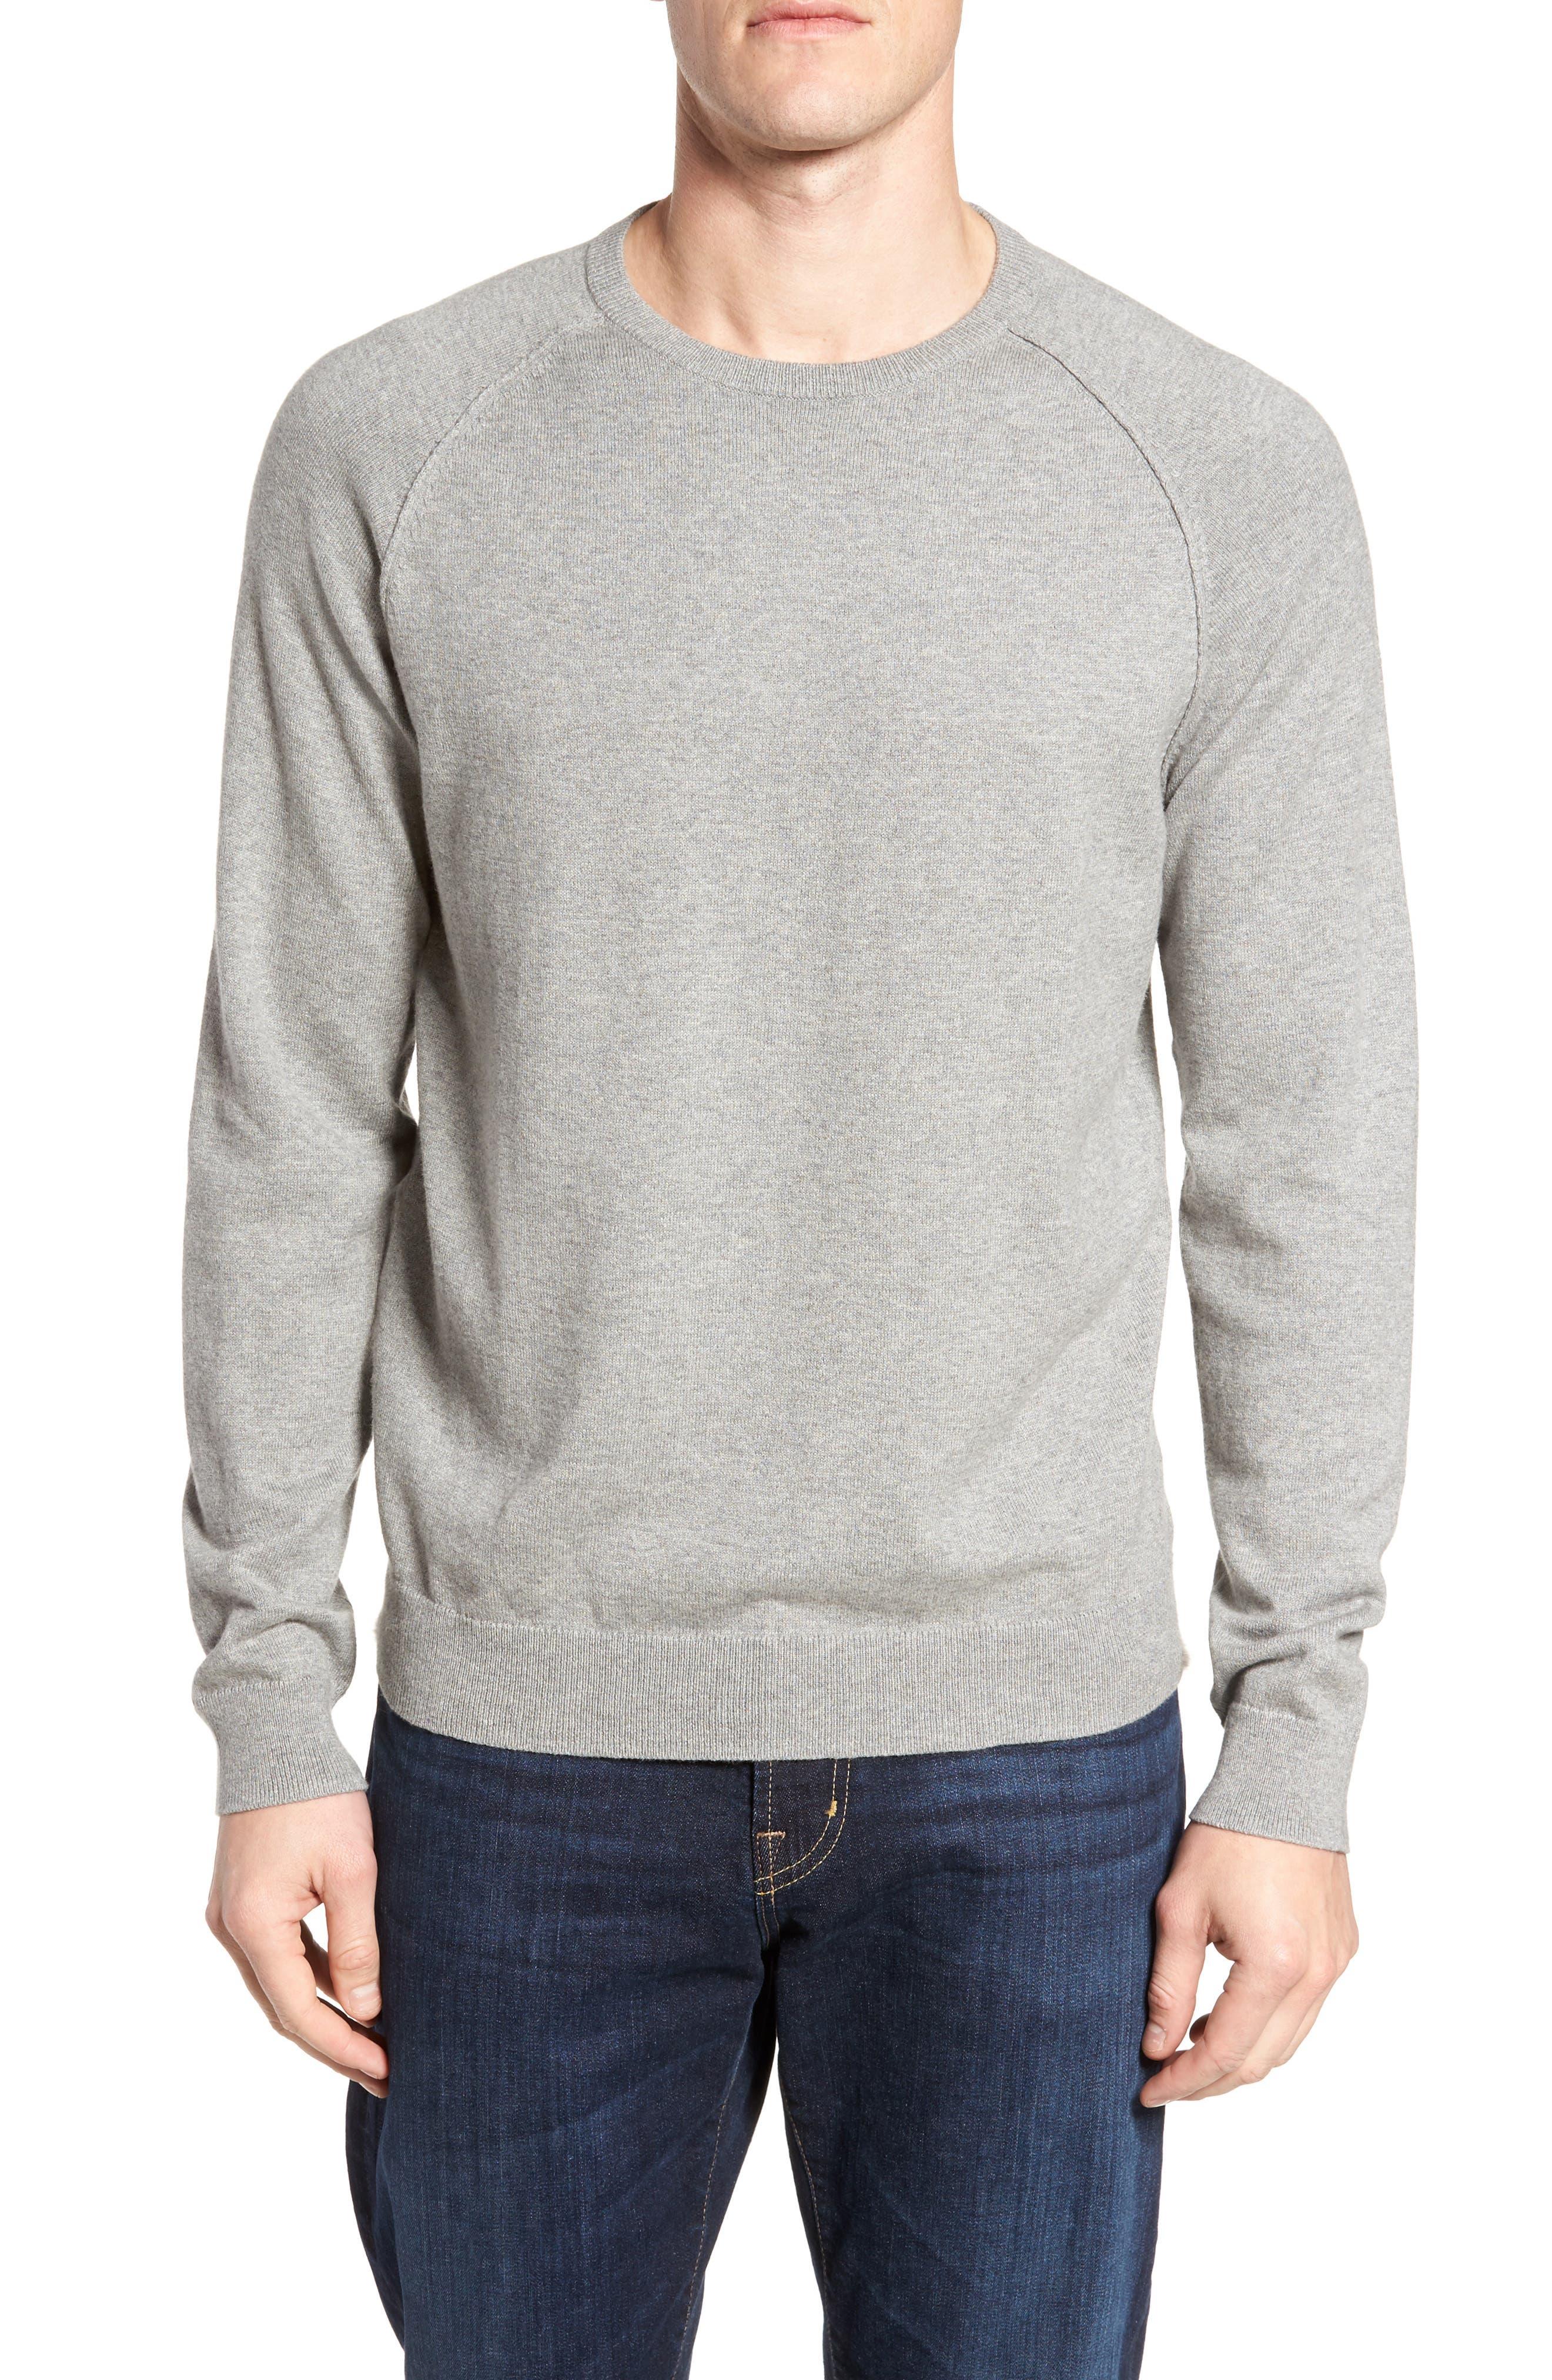 Saddle Shoulder Cotton & Cashmere Sweater,                             Main thumbnail 1, color,                             Grey Heather